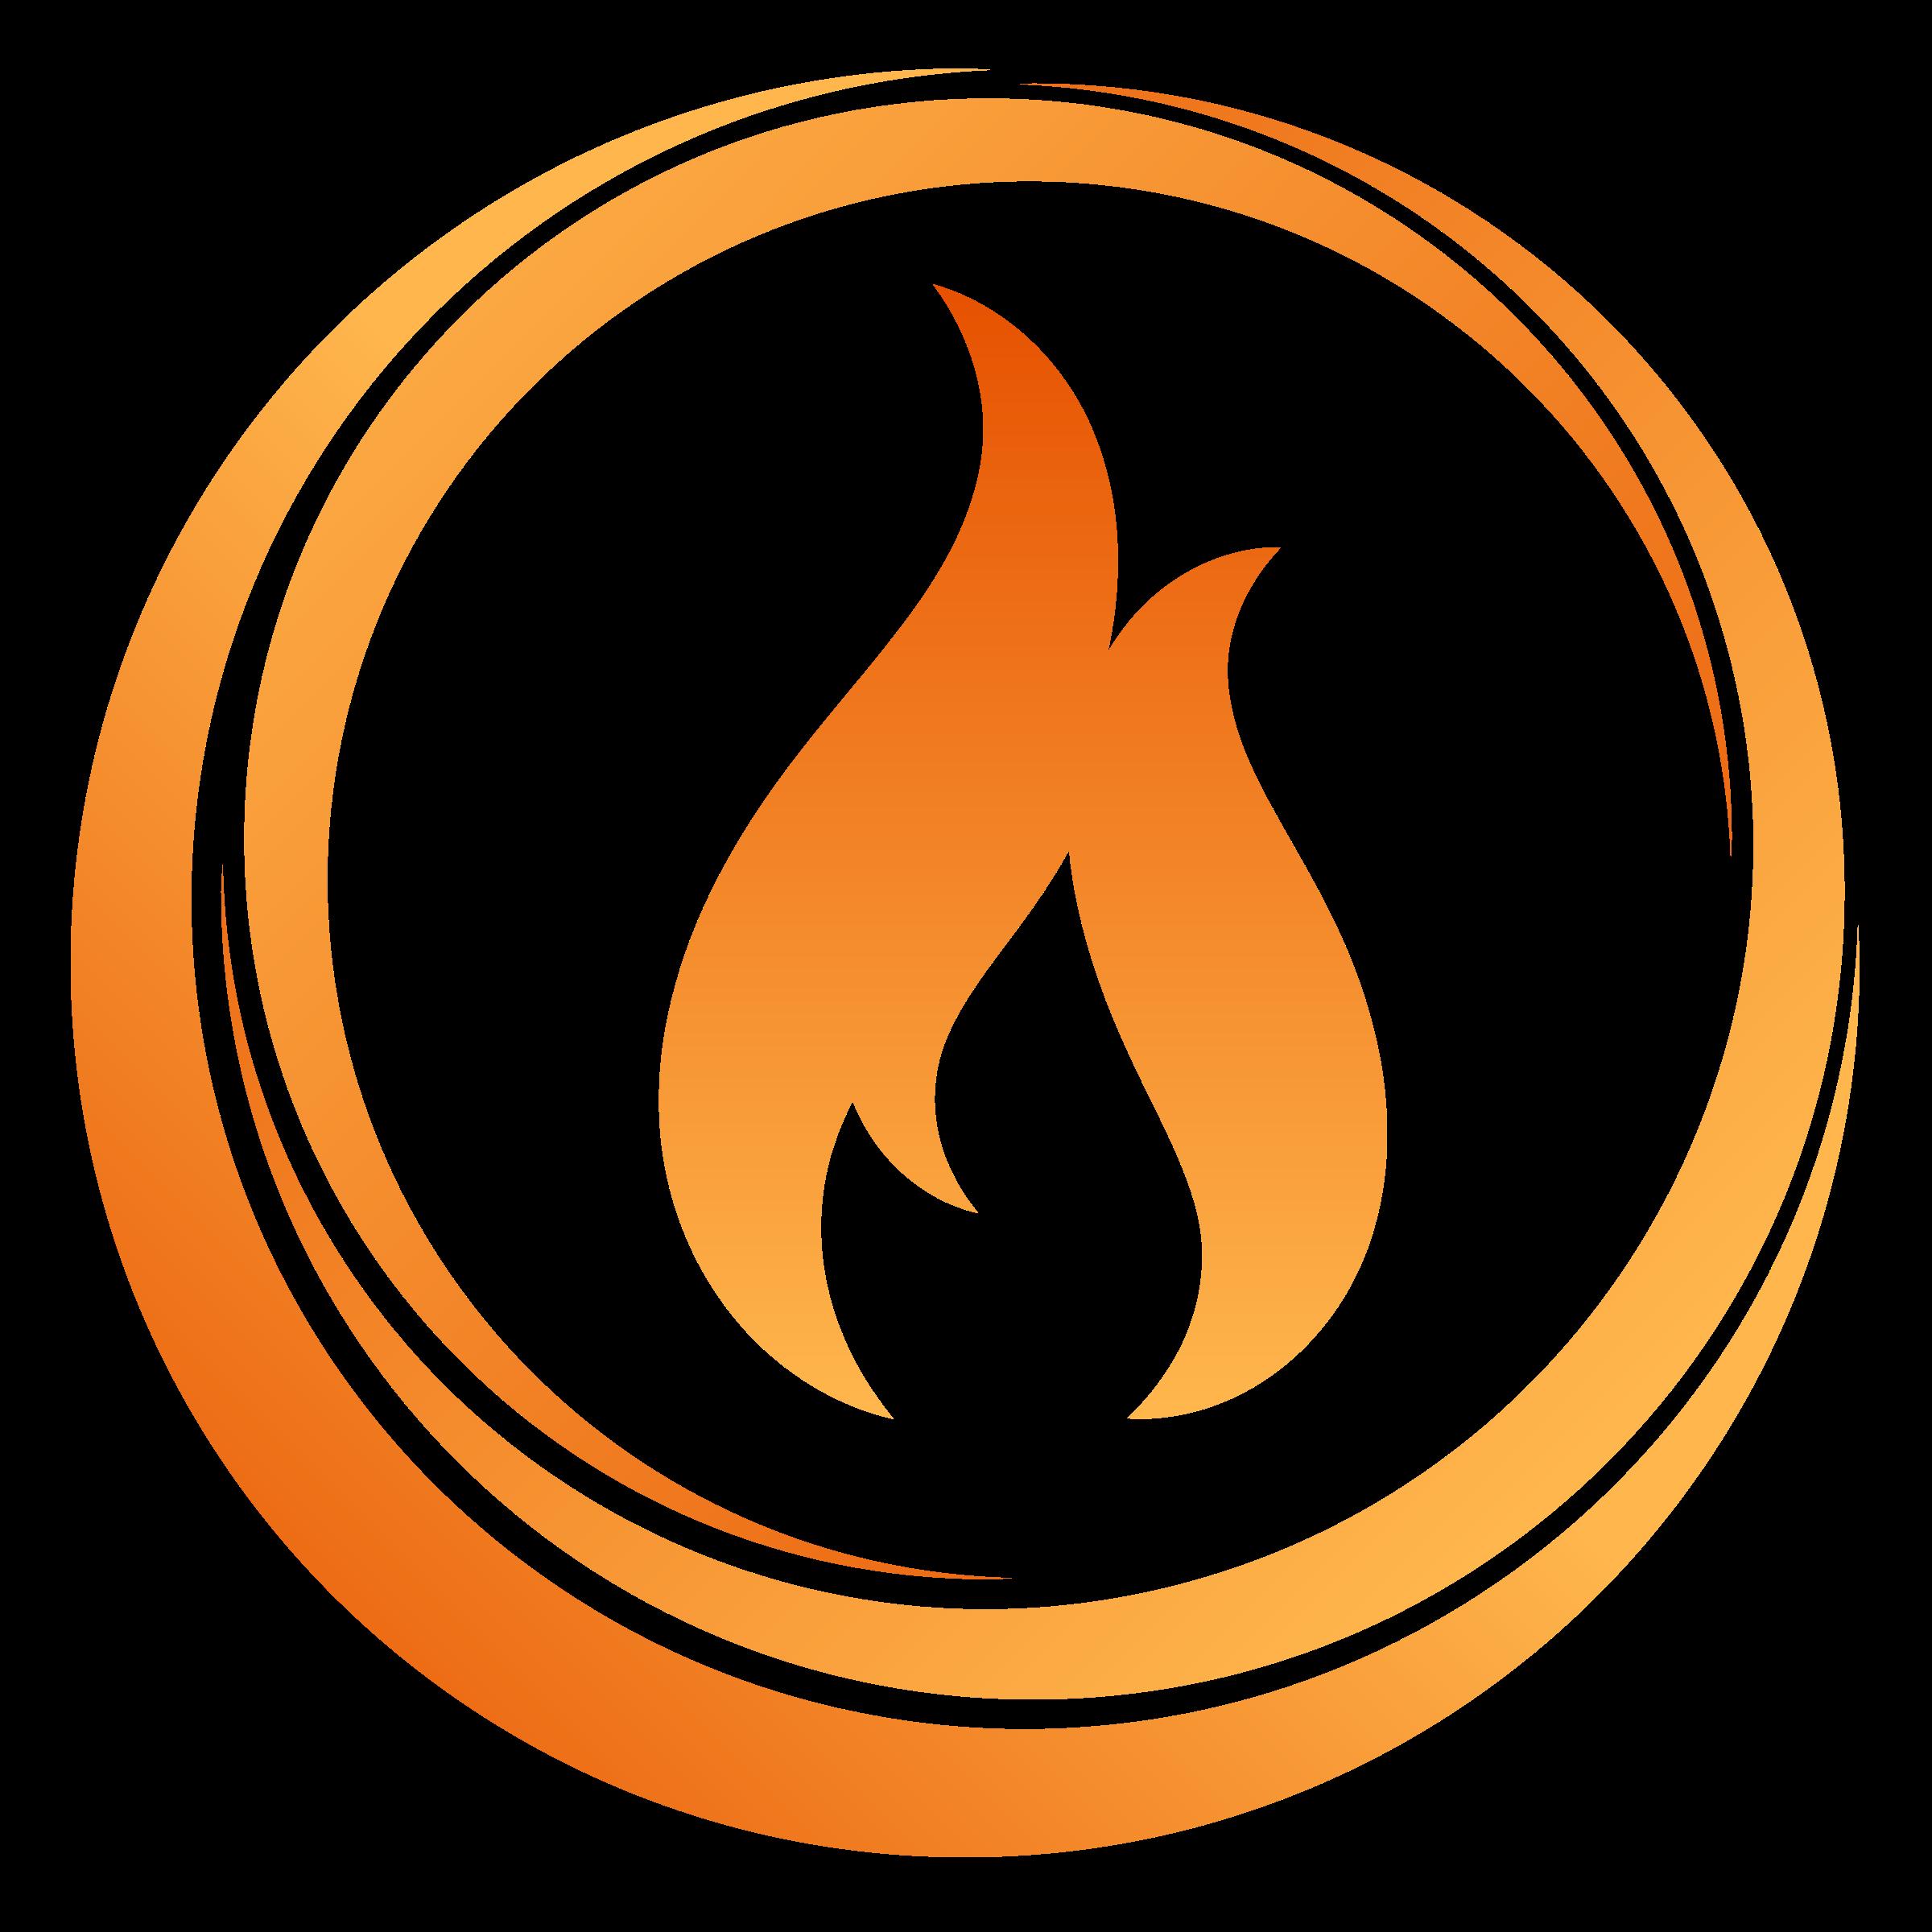 Circle clipart fire. Big image png